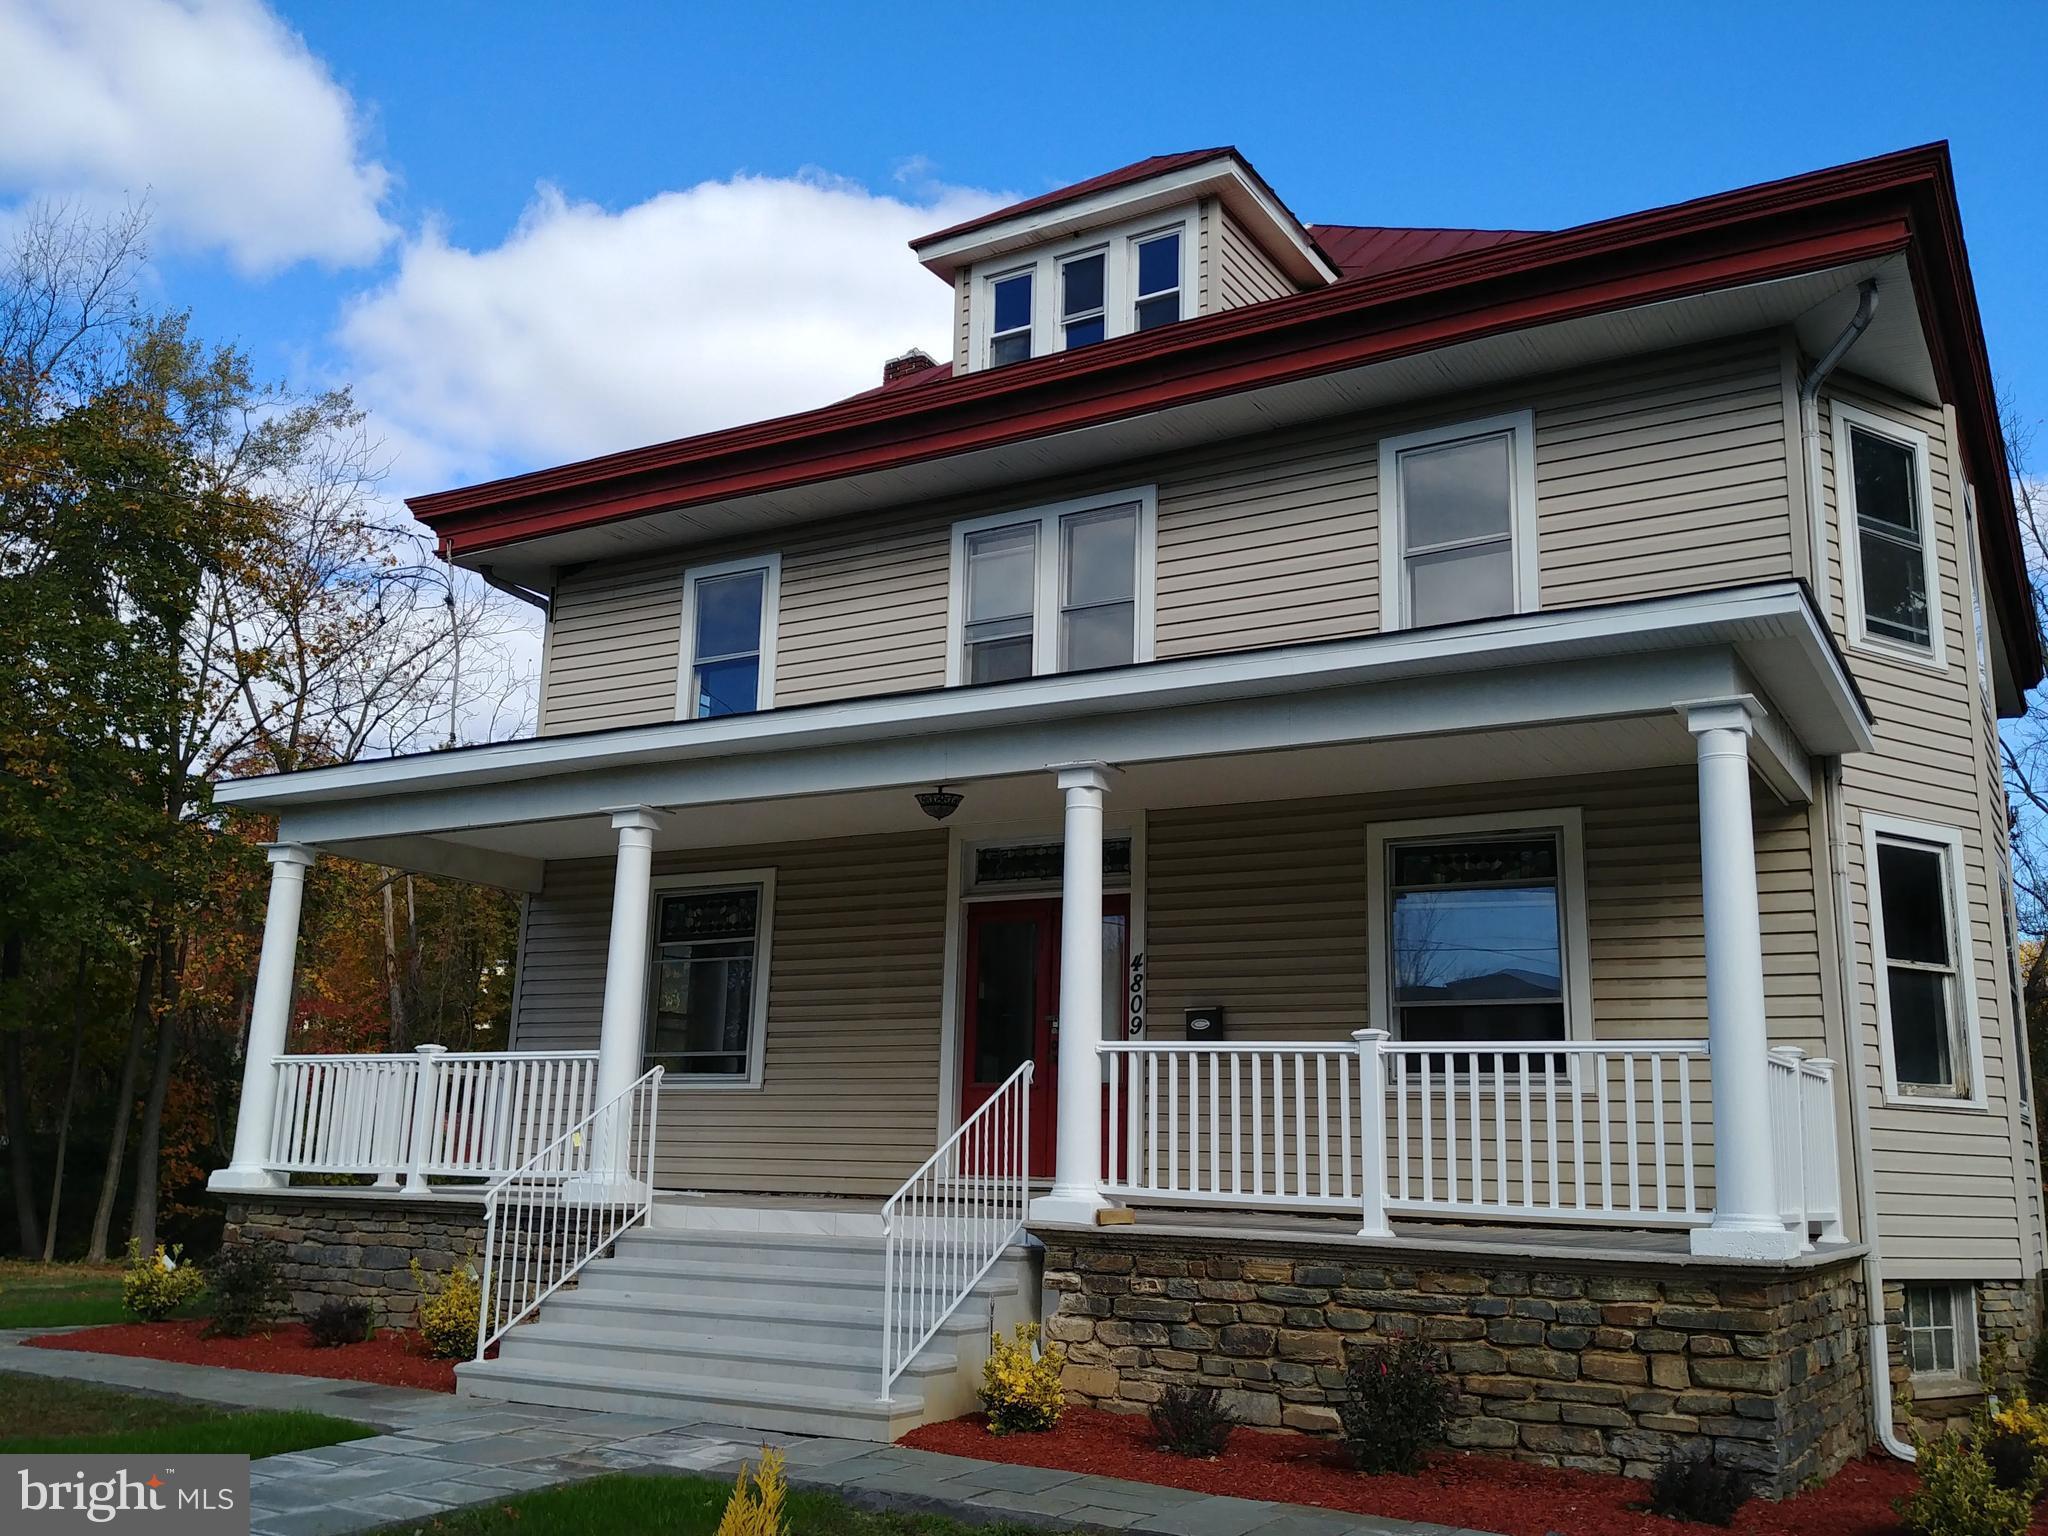 4809 Ridge Avenue, Feasterville Trevose, PA 19053